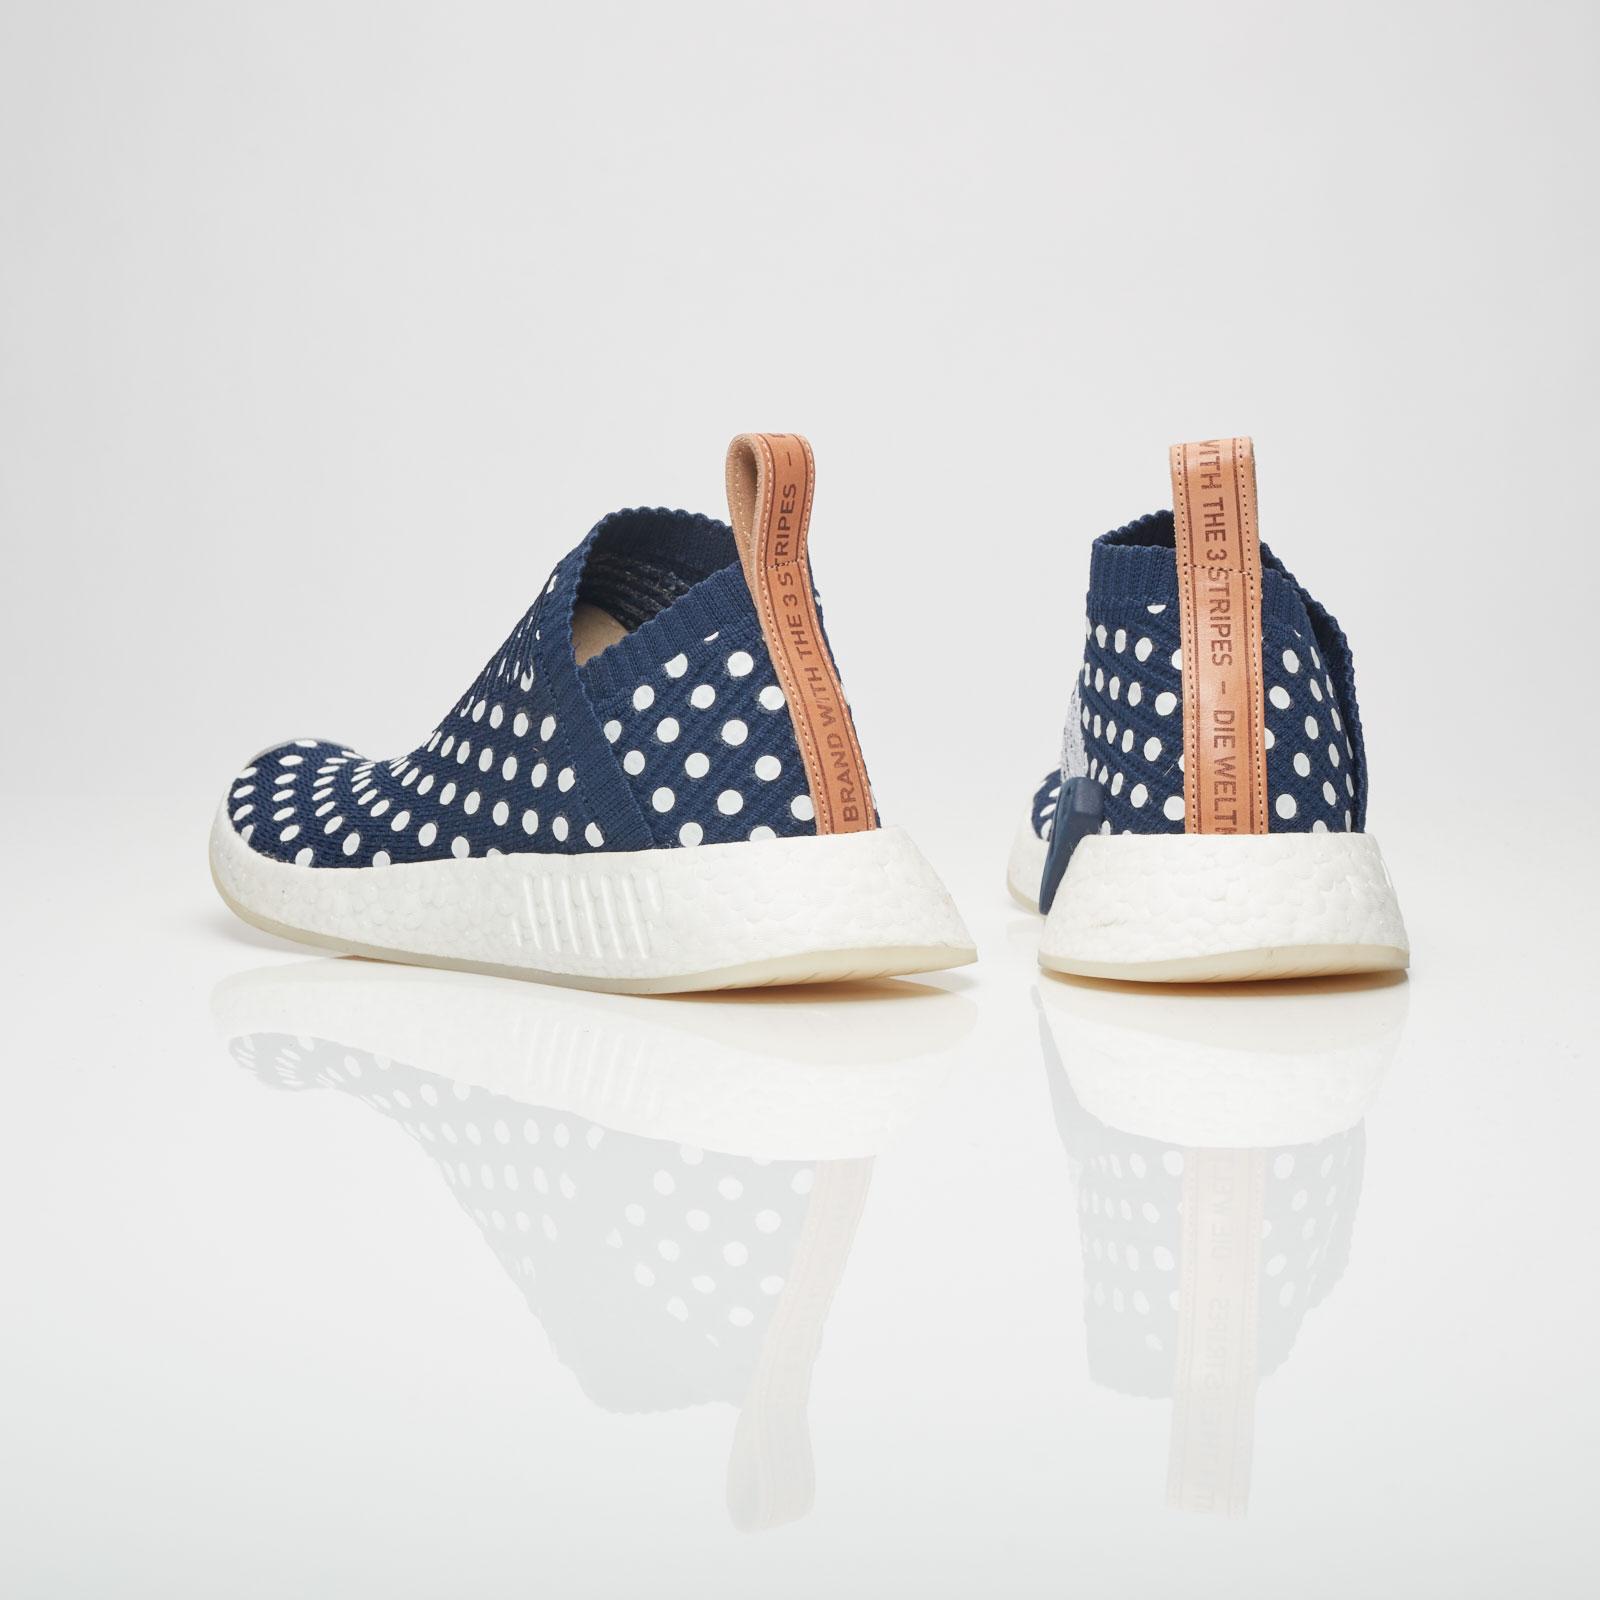 d3a3bd3f3 adidas Nmd CS2 PK W - Ba7212 - Sneakersnstuff